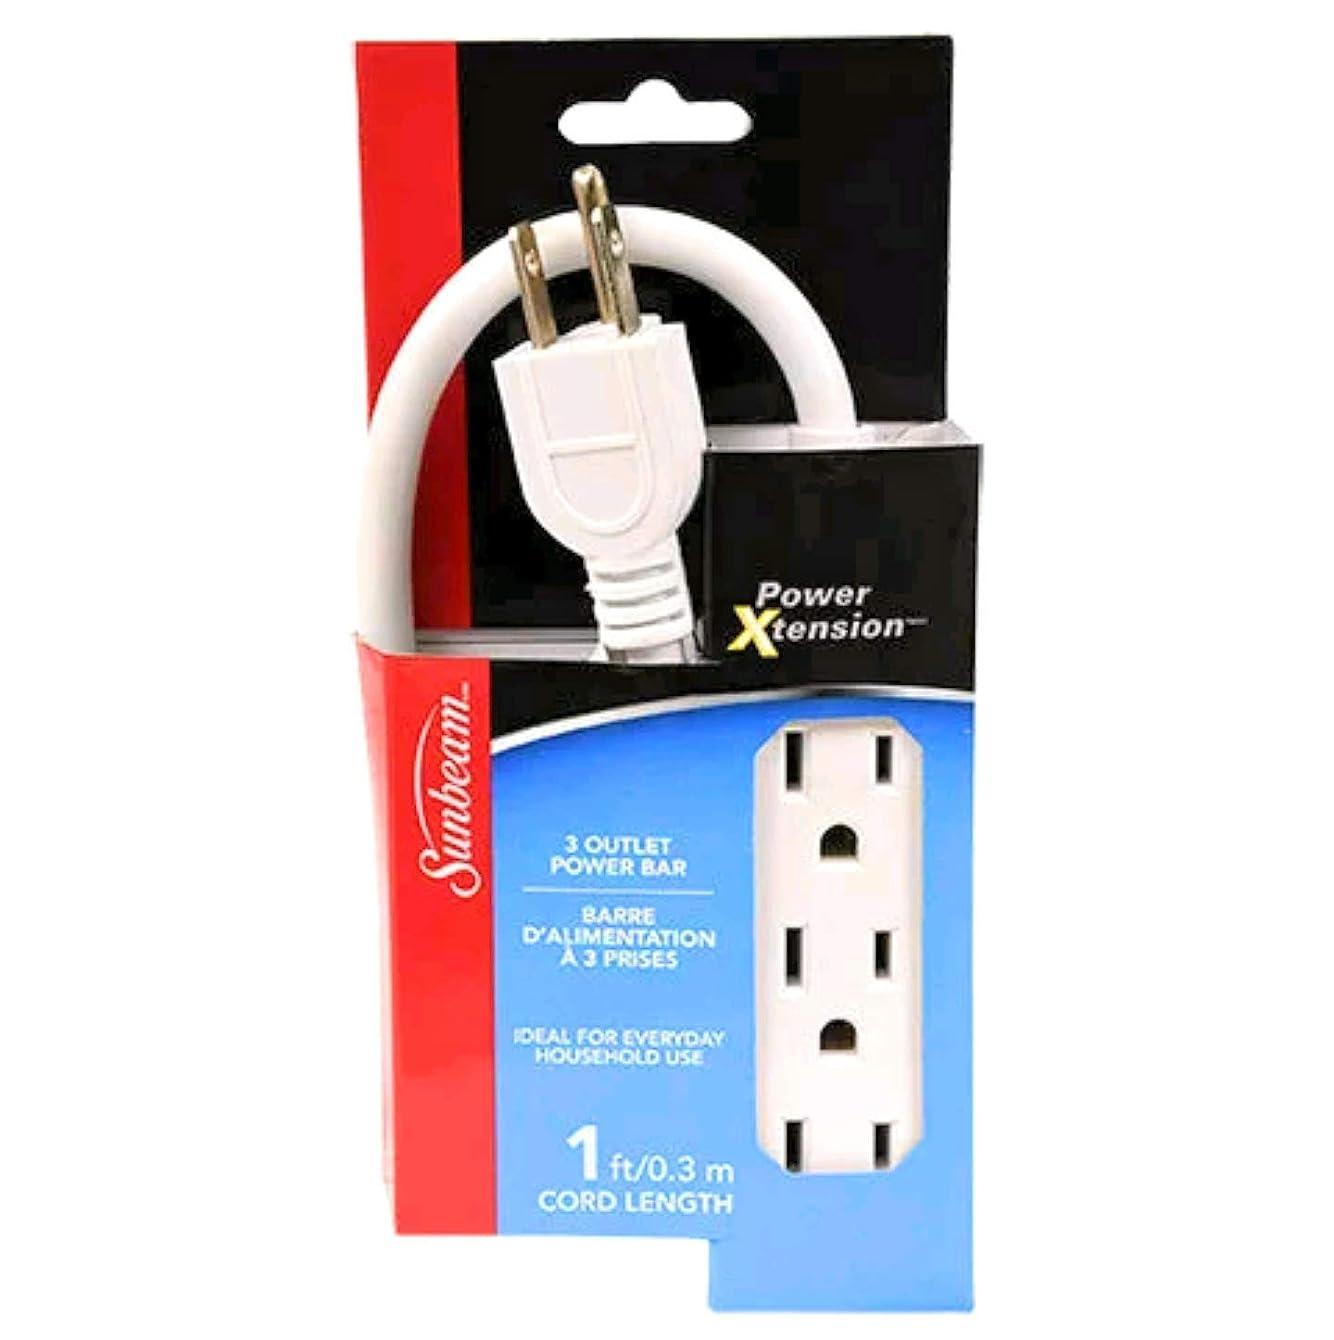 Sunbeam 3 Outlet Power Bar Extension Cord